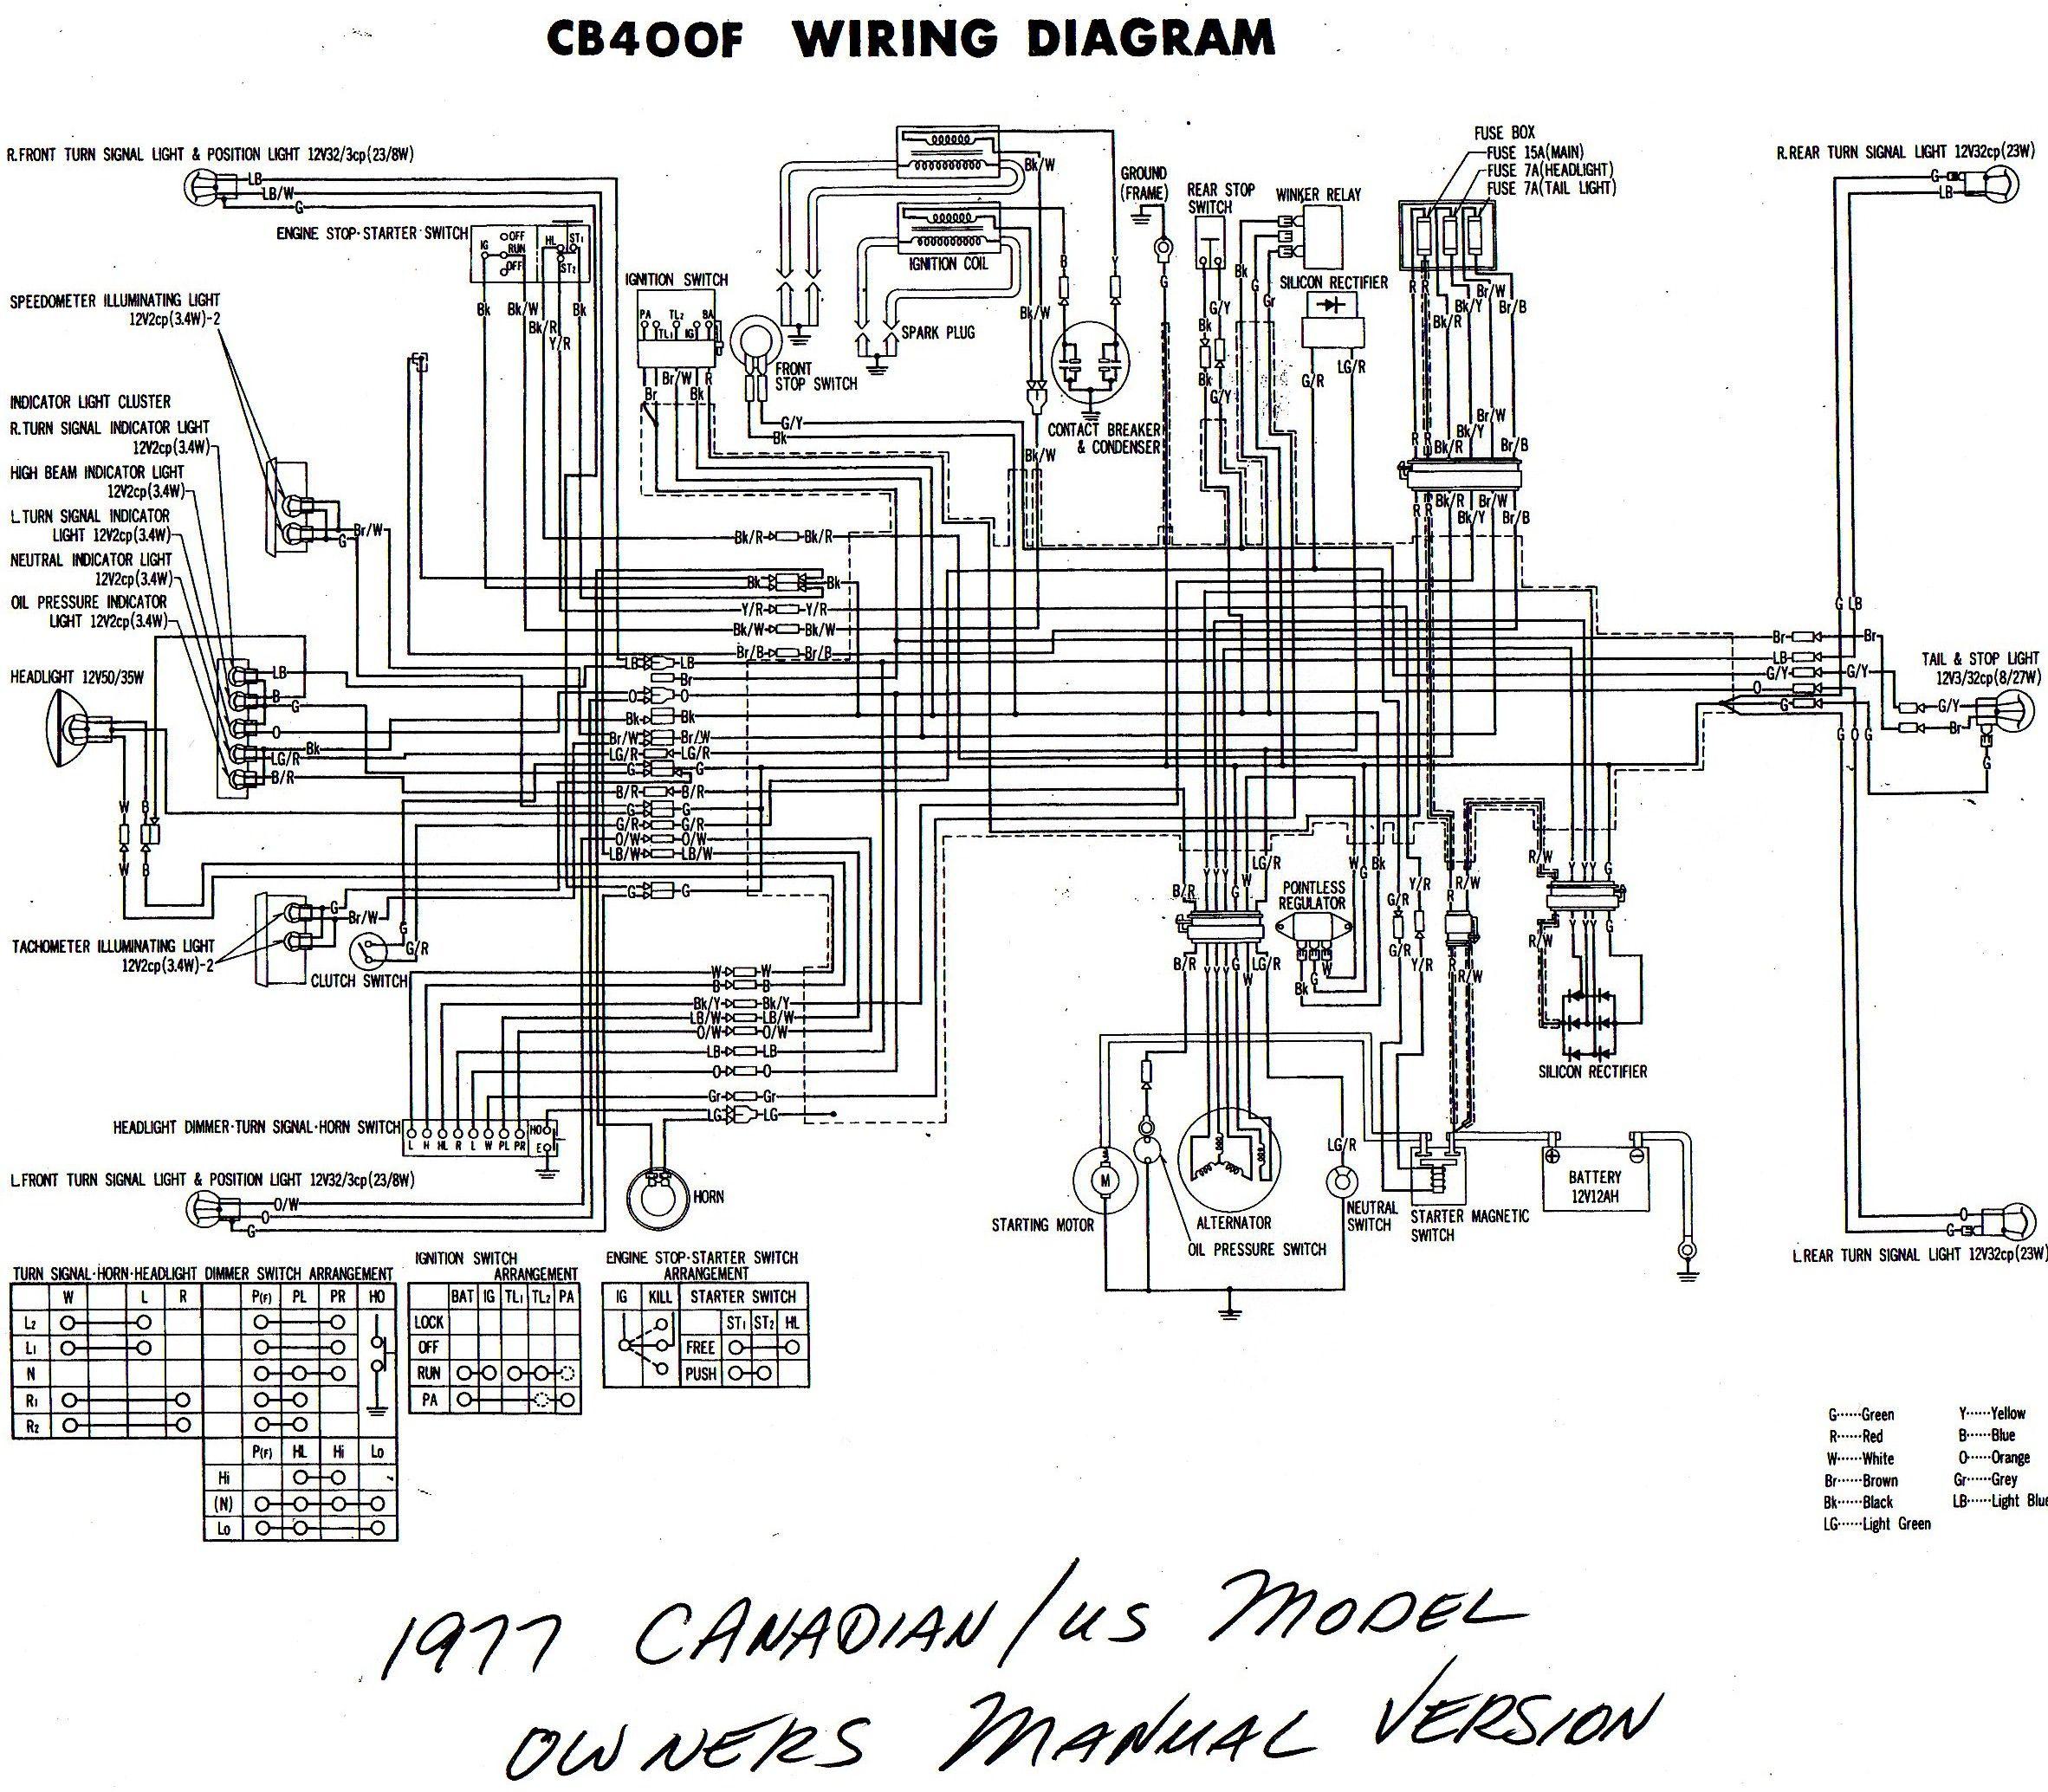 Cb400 Wiring Diagram